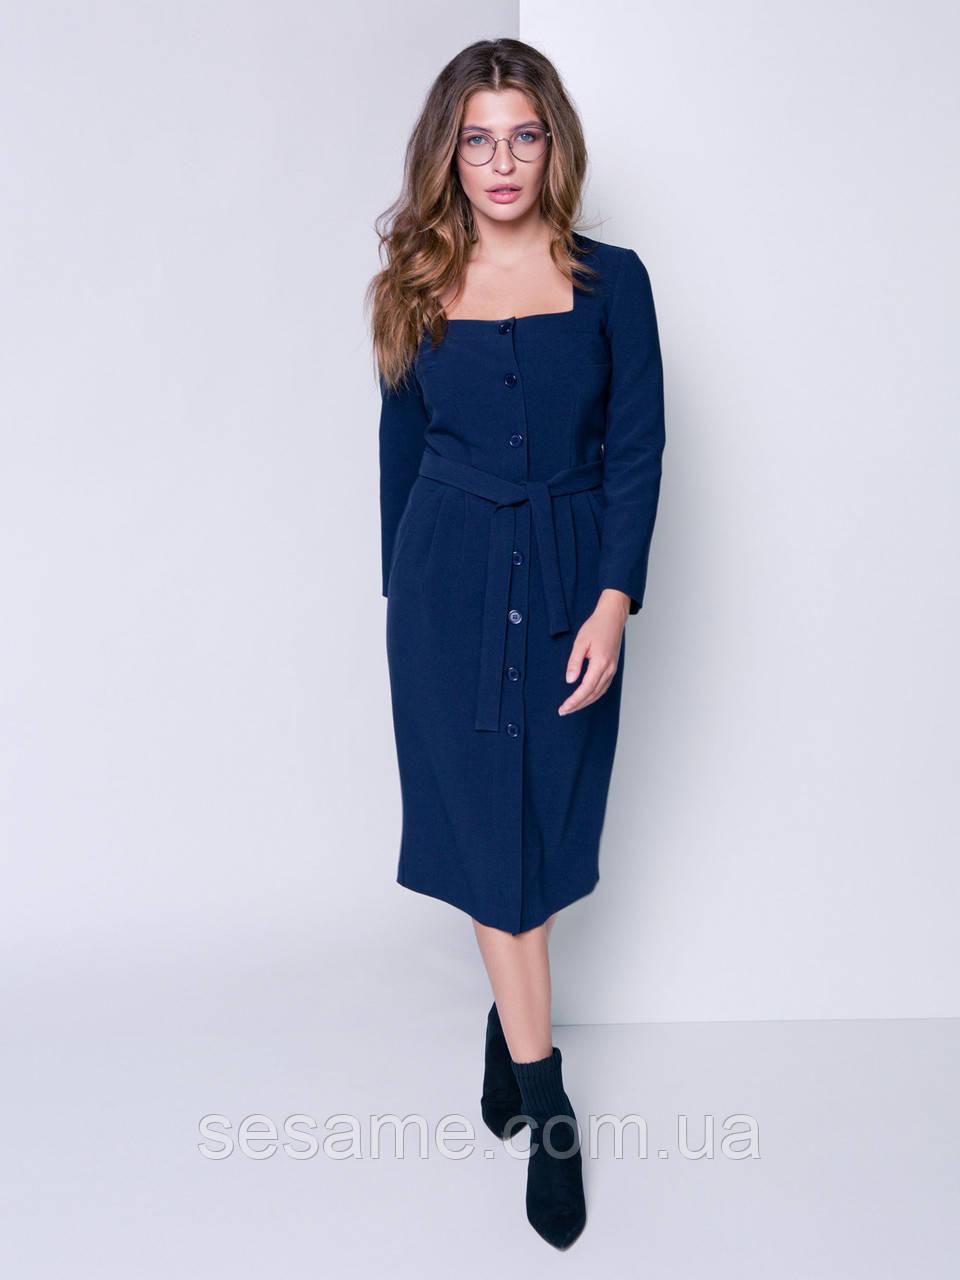 grand ua Таниэль платье